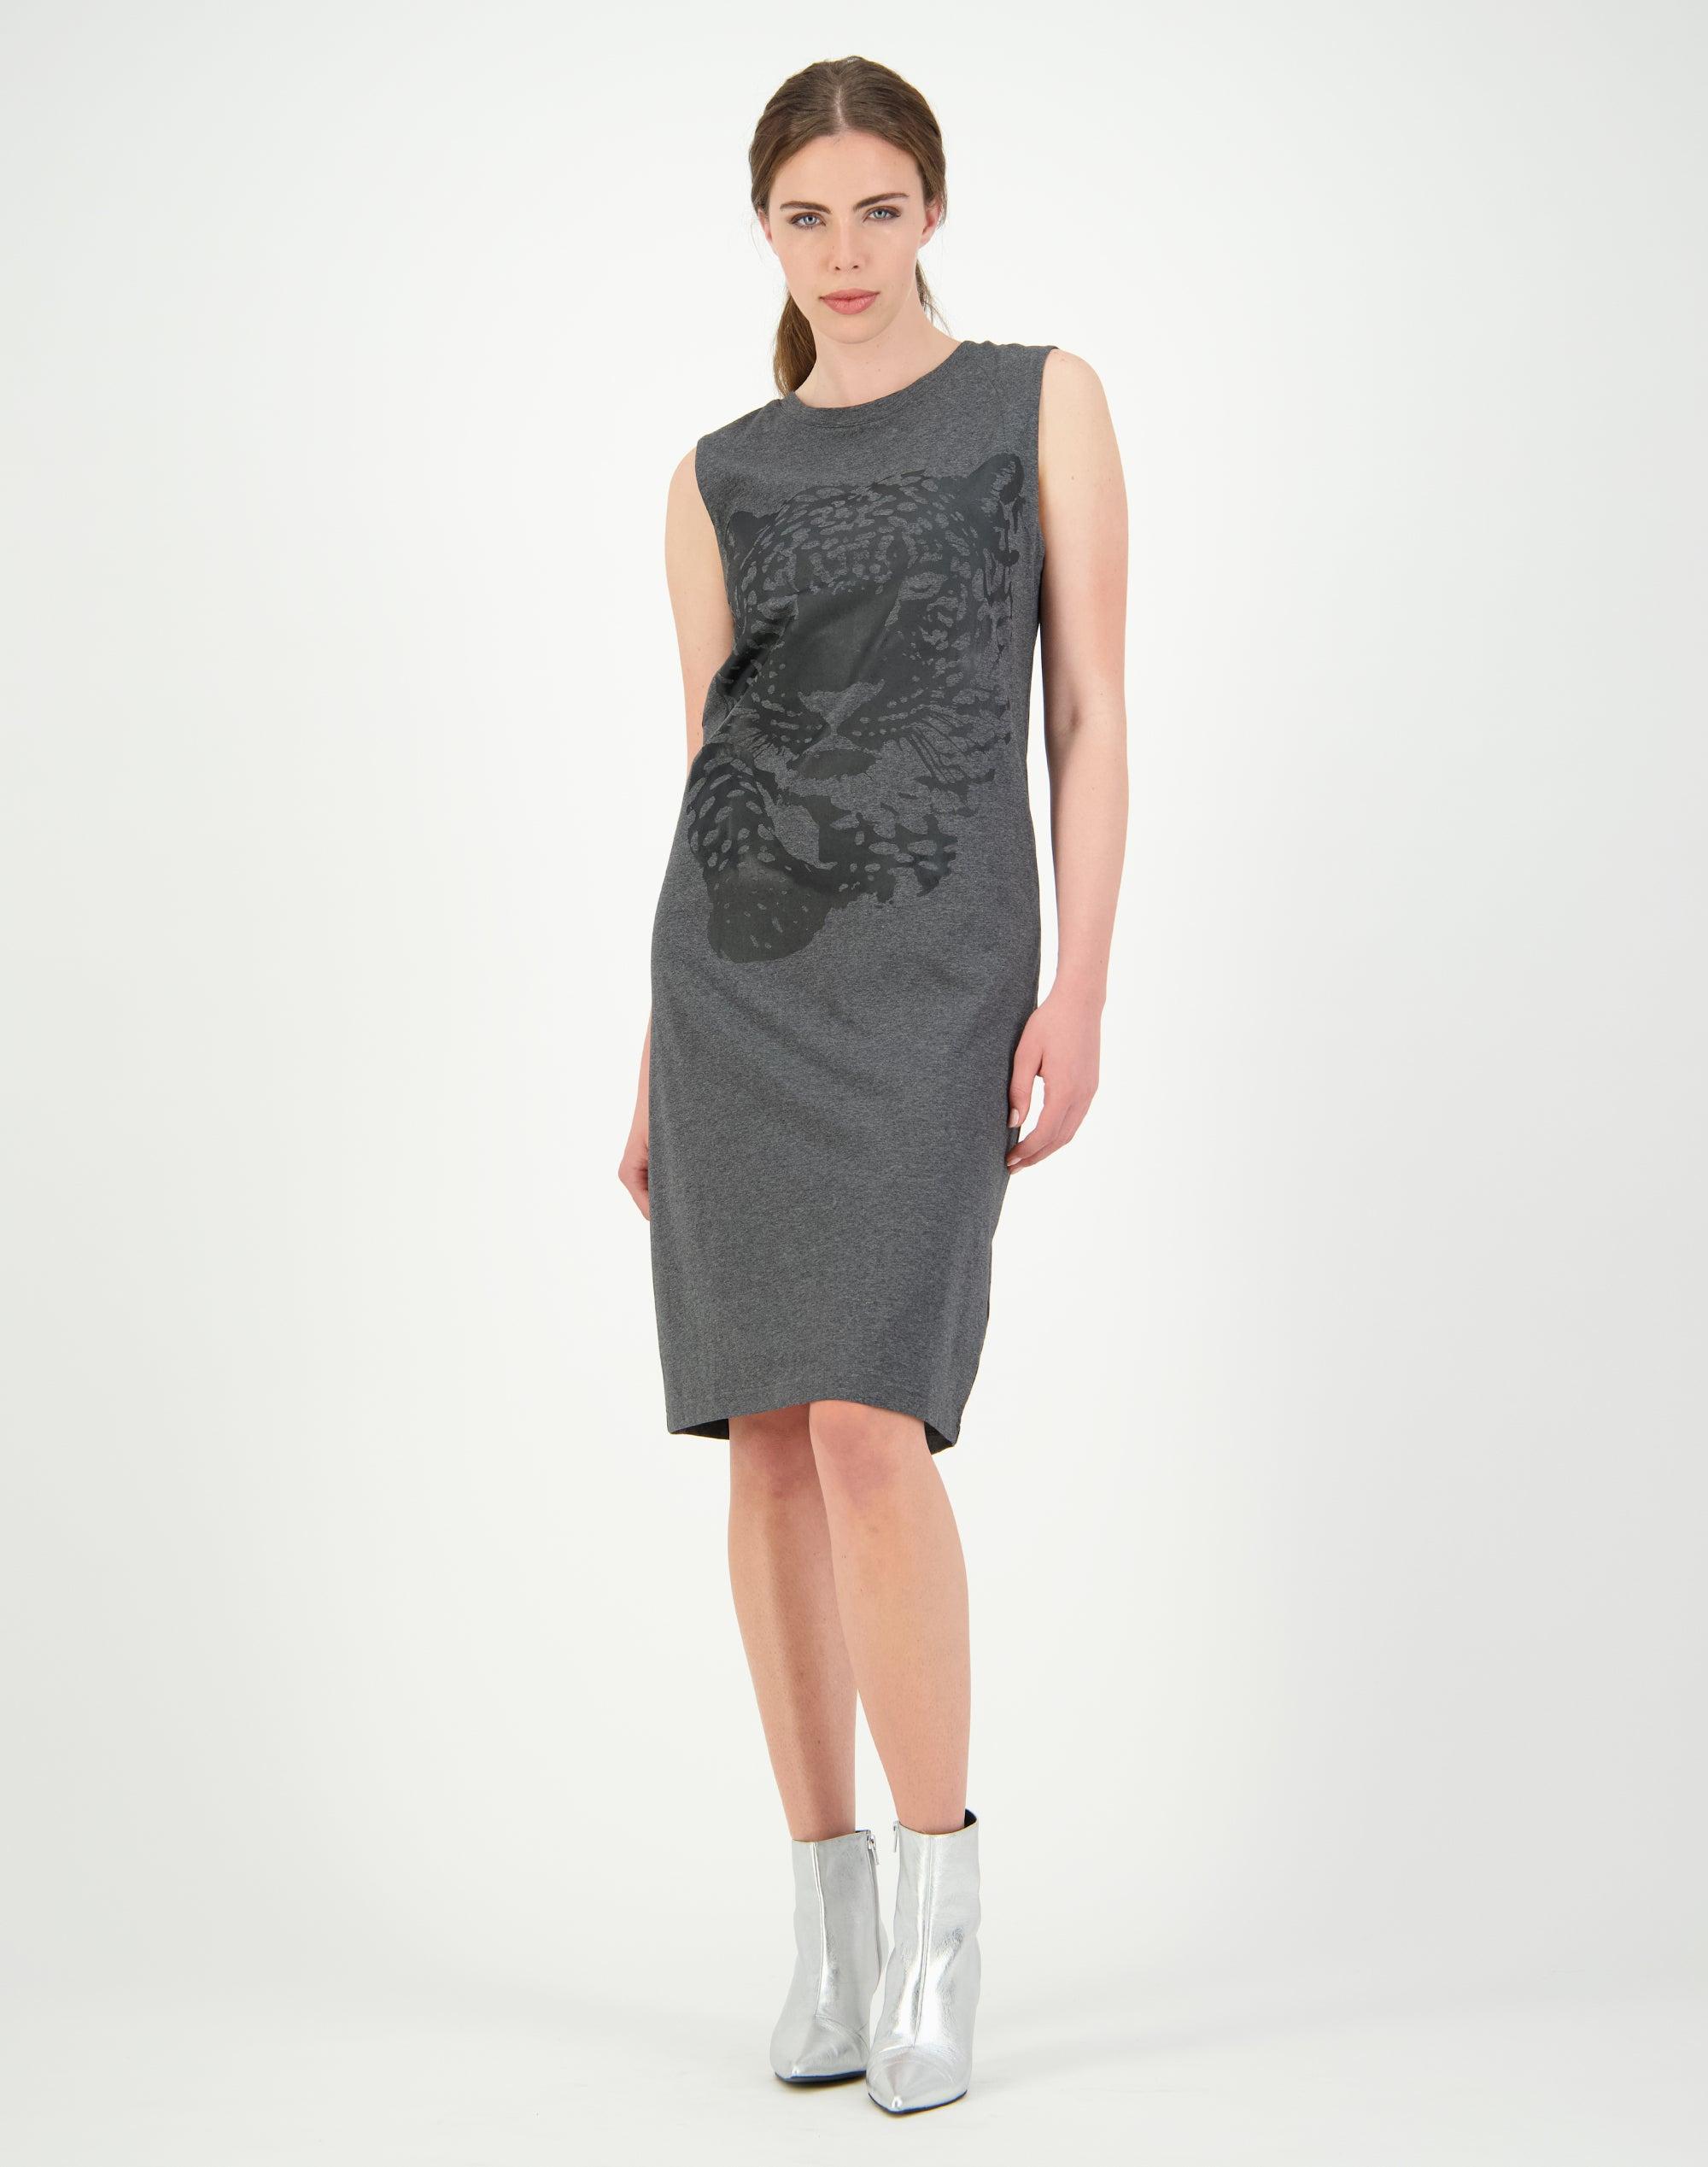 Leopard Knit Dress